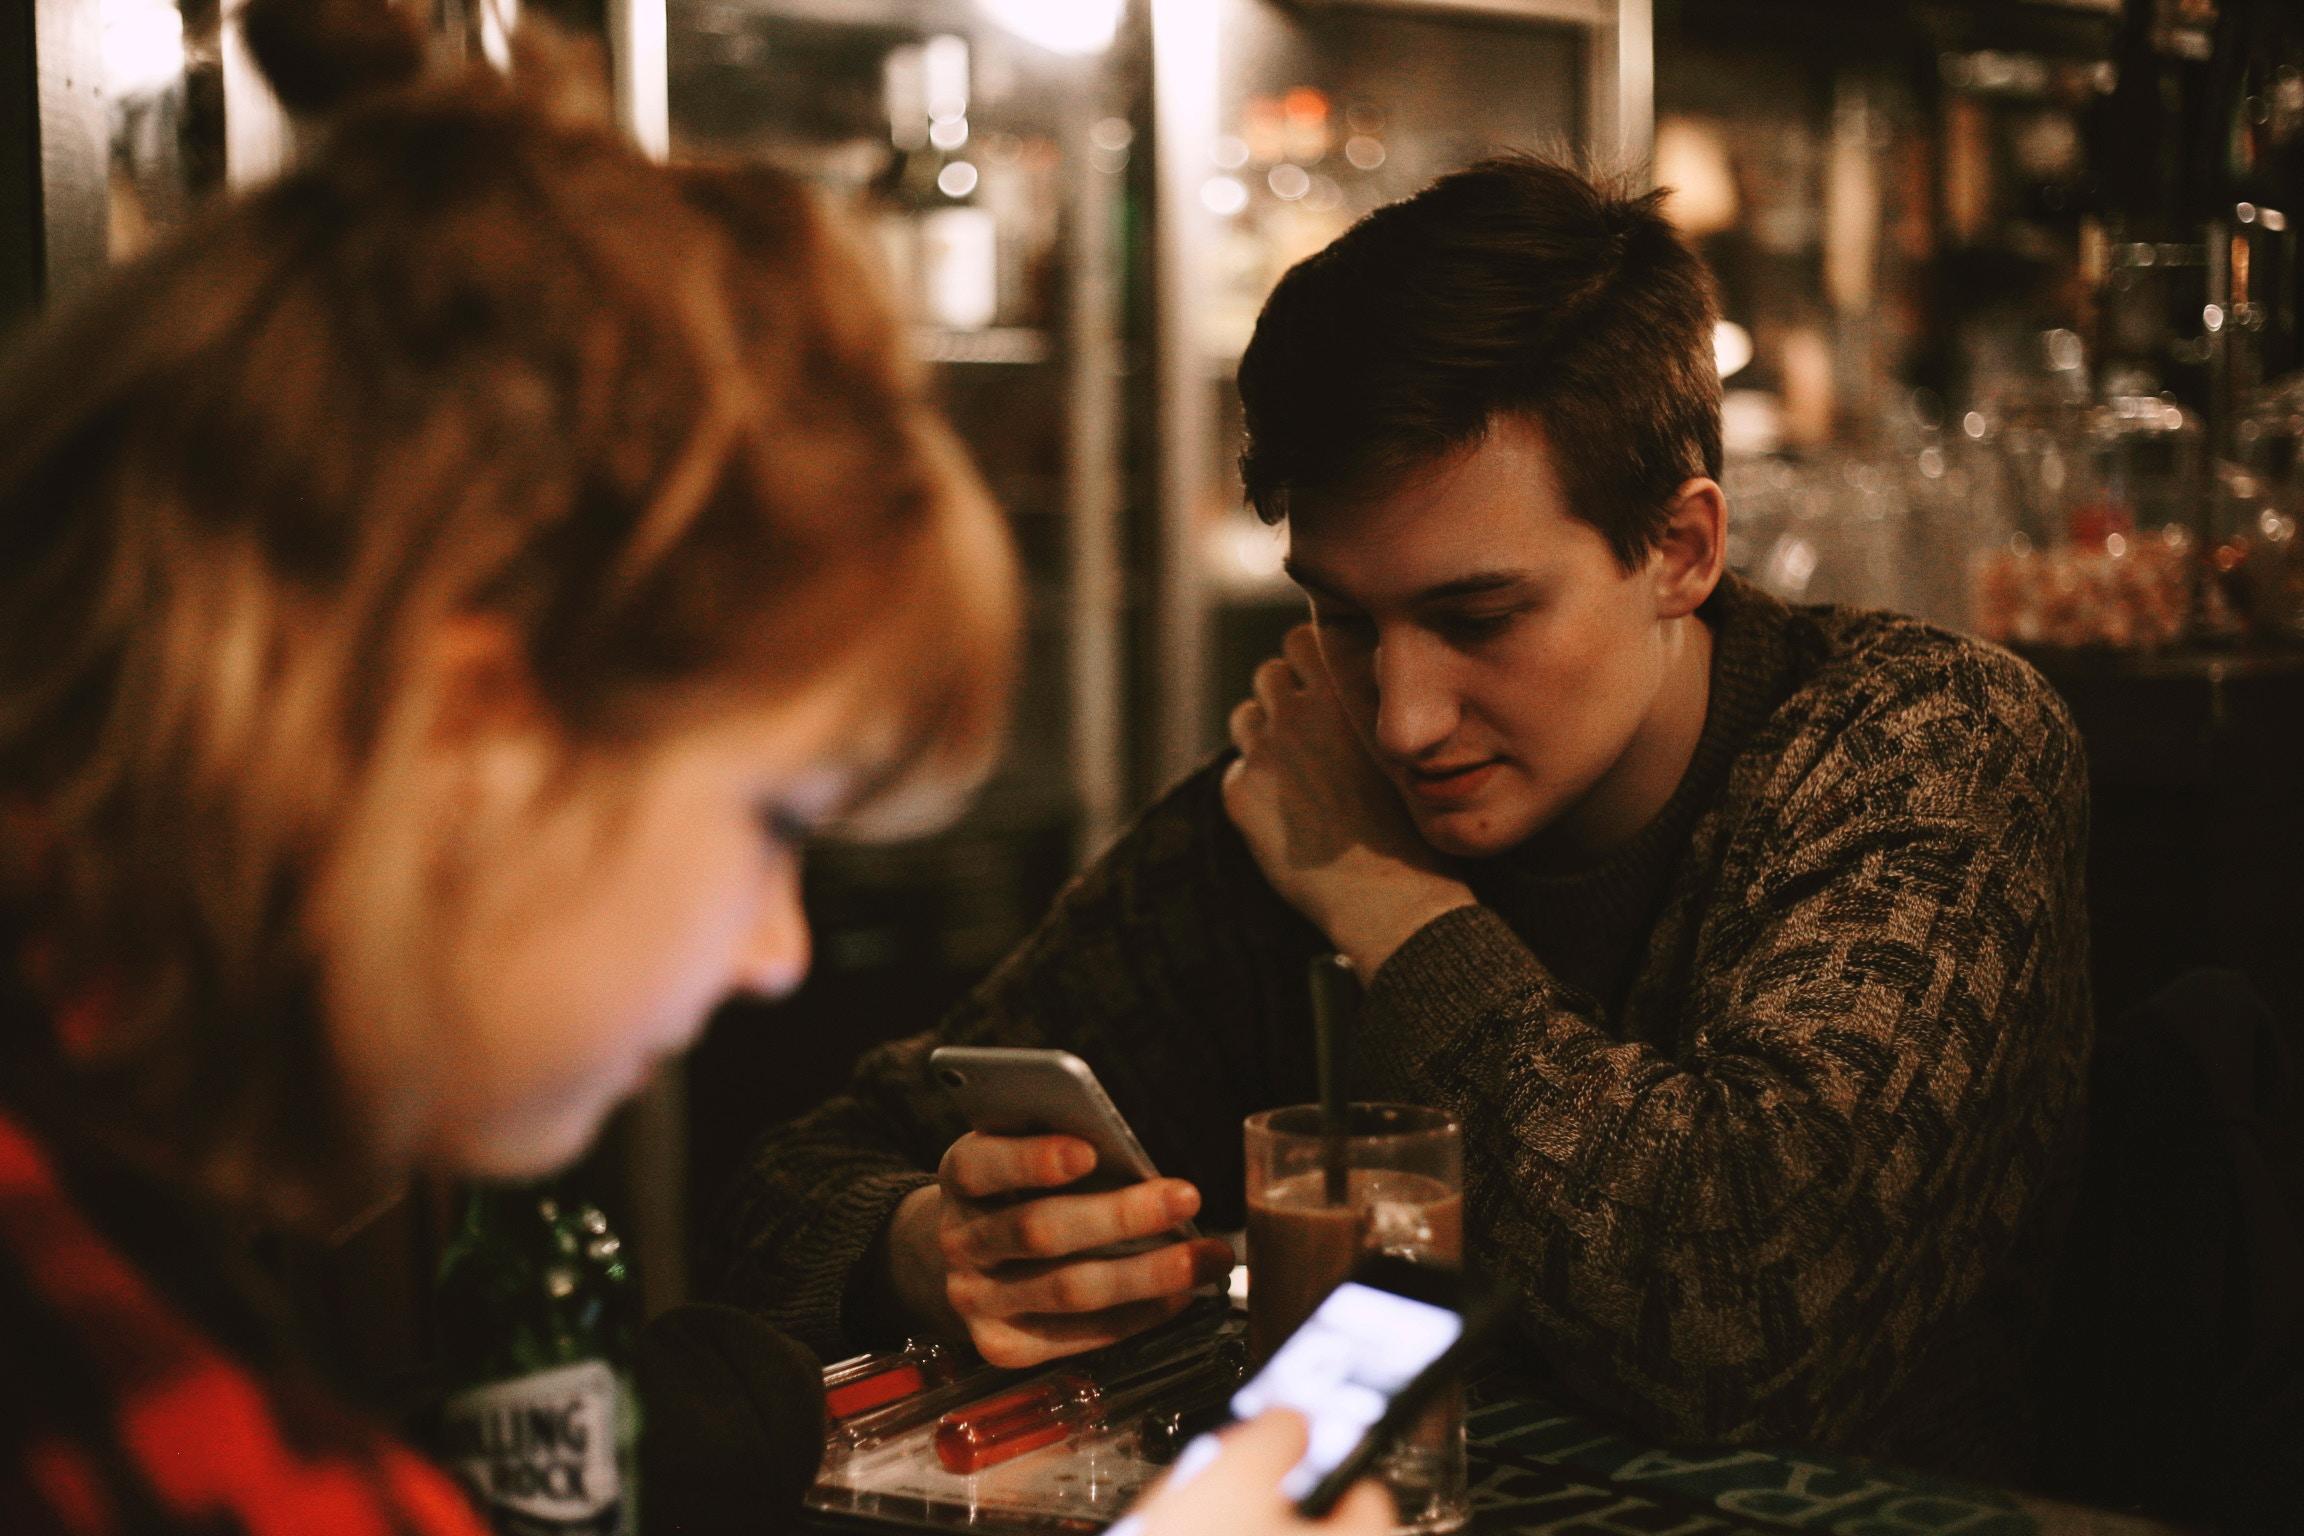 Is social media bad for us?